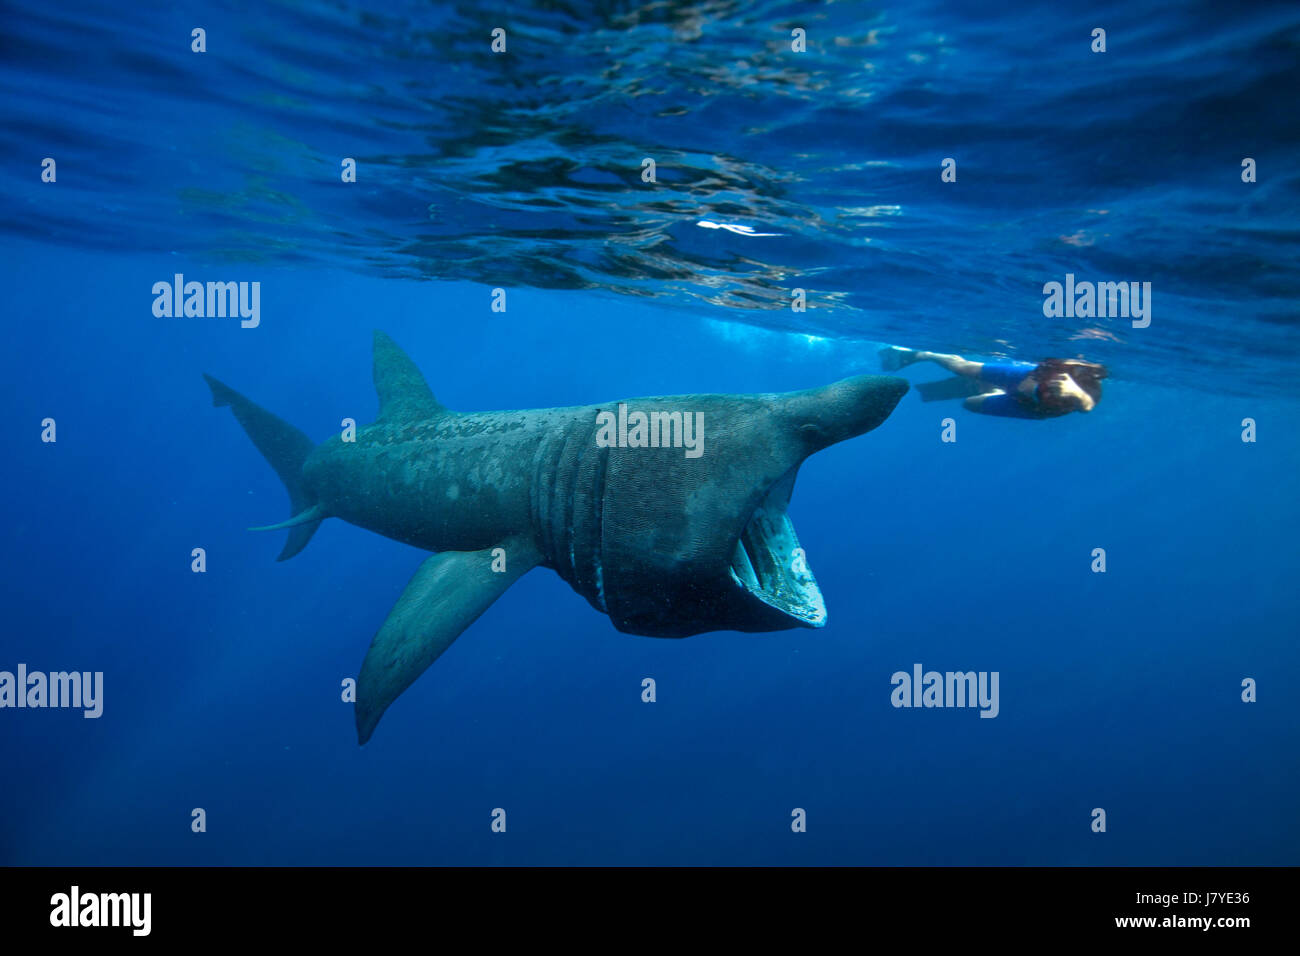 Basking shark, Cetorhinus maximus. Berlengas, Portugal. - Stock Image